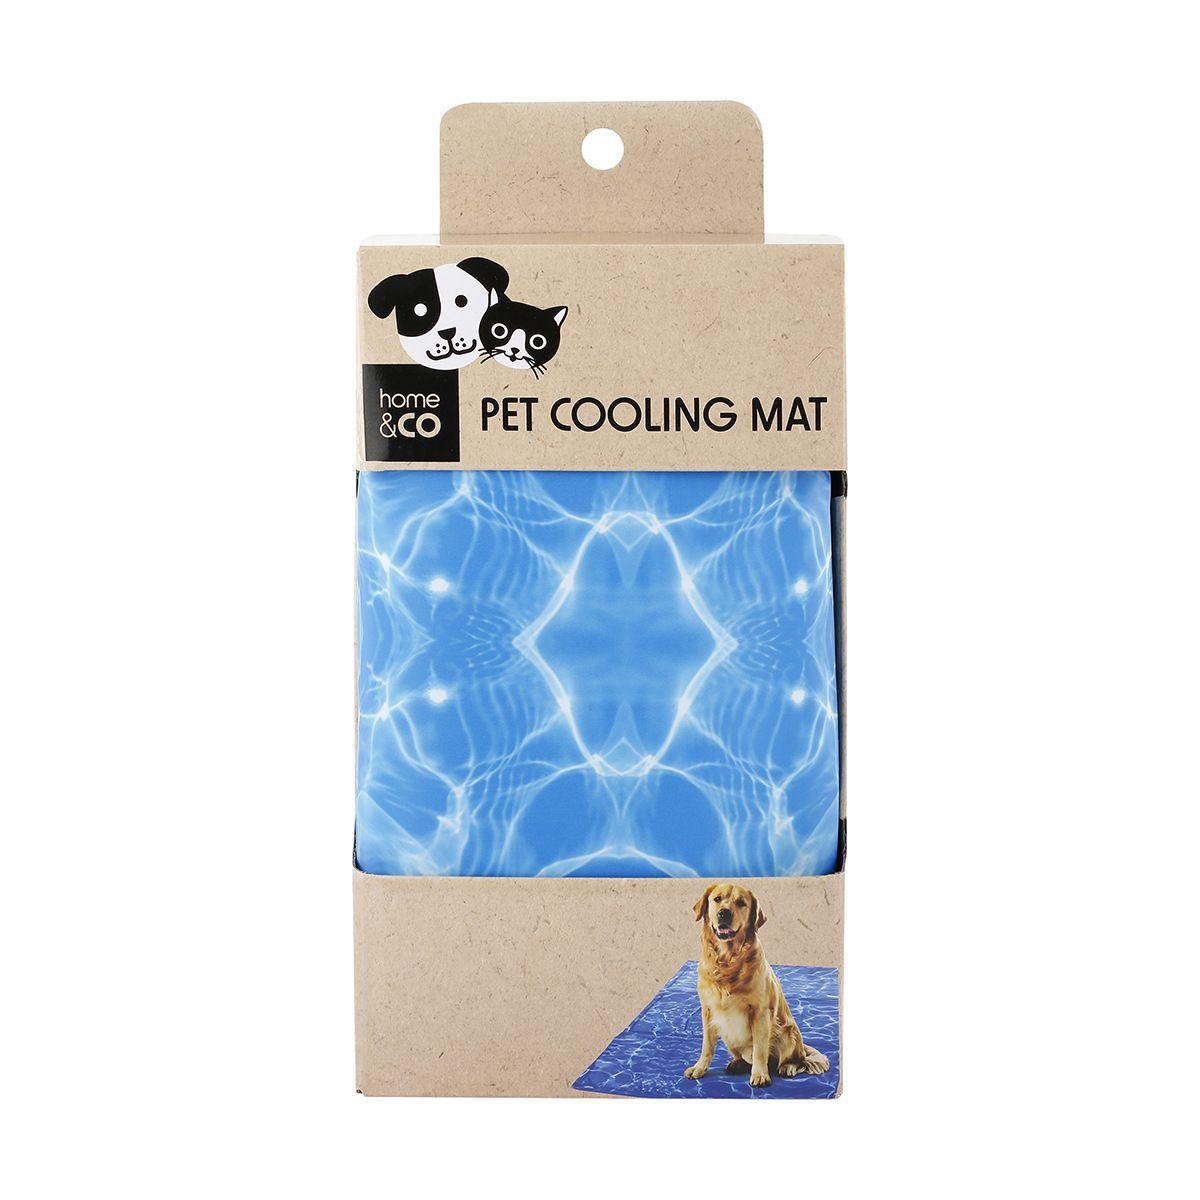 Pet Cooling Mat Kmart Cool pets